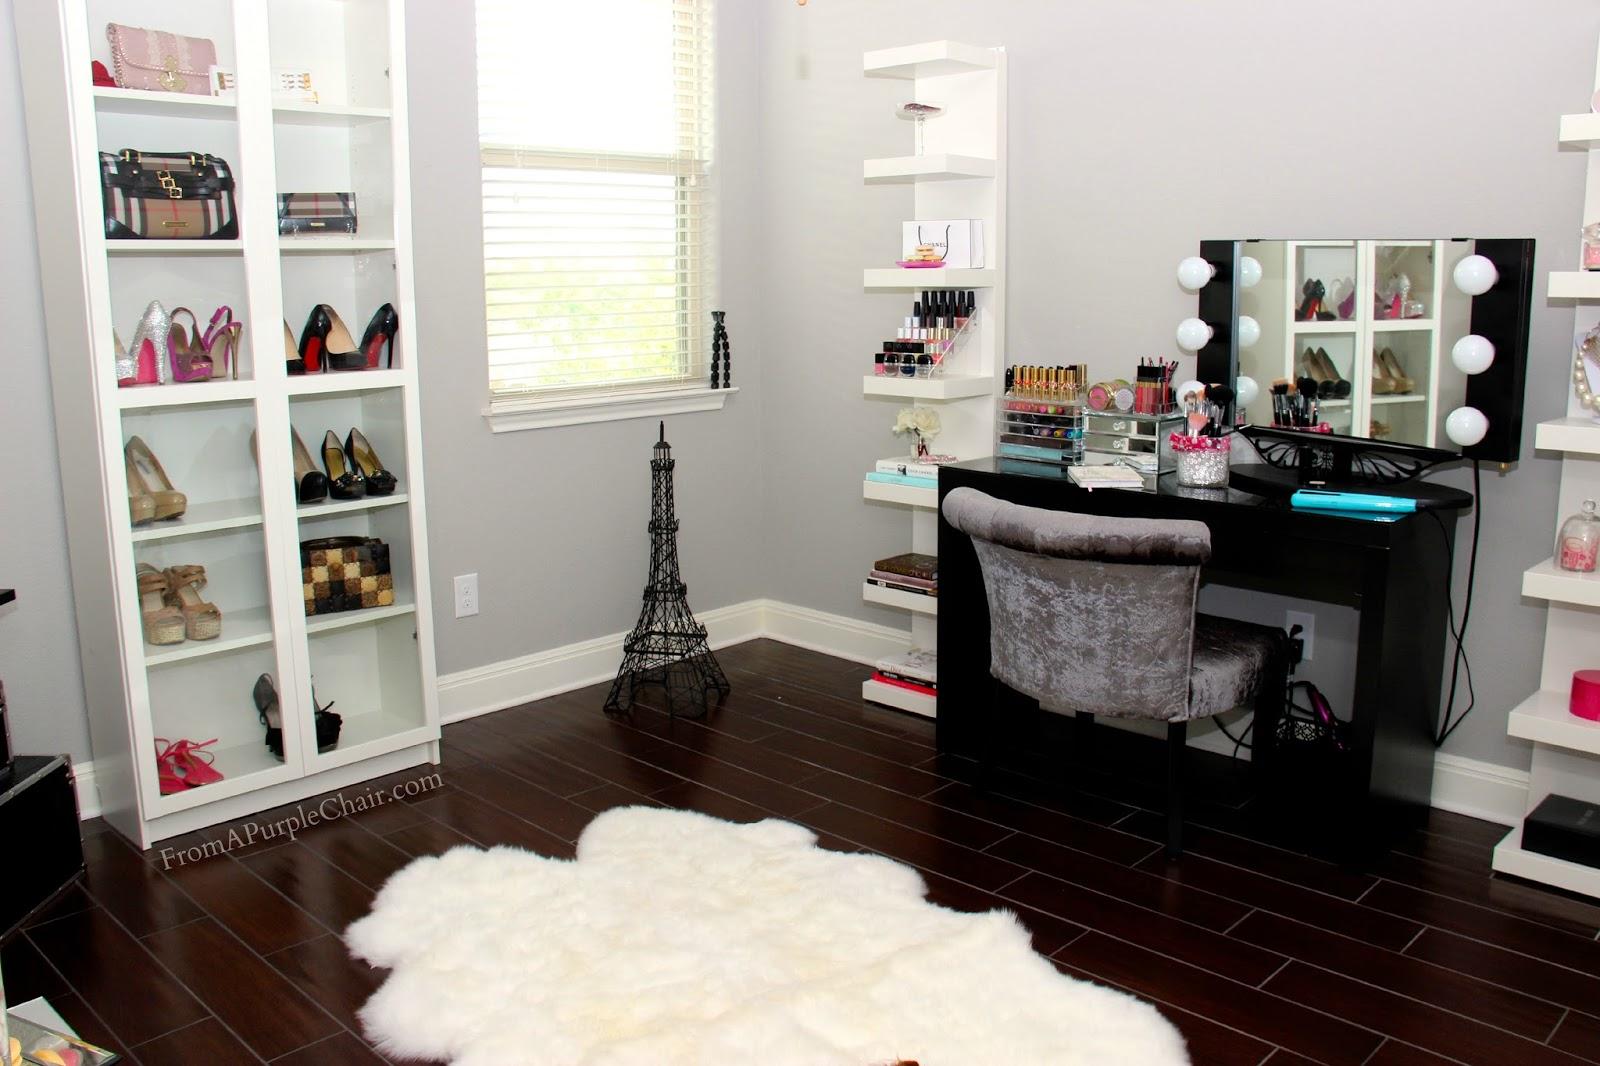 Makeup Room/Beauty Room Set Up (Before) - Miss Liz Heart on Makeup Room Design  id=98281